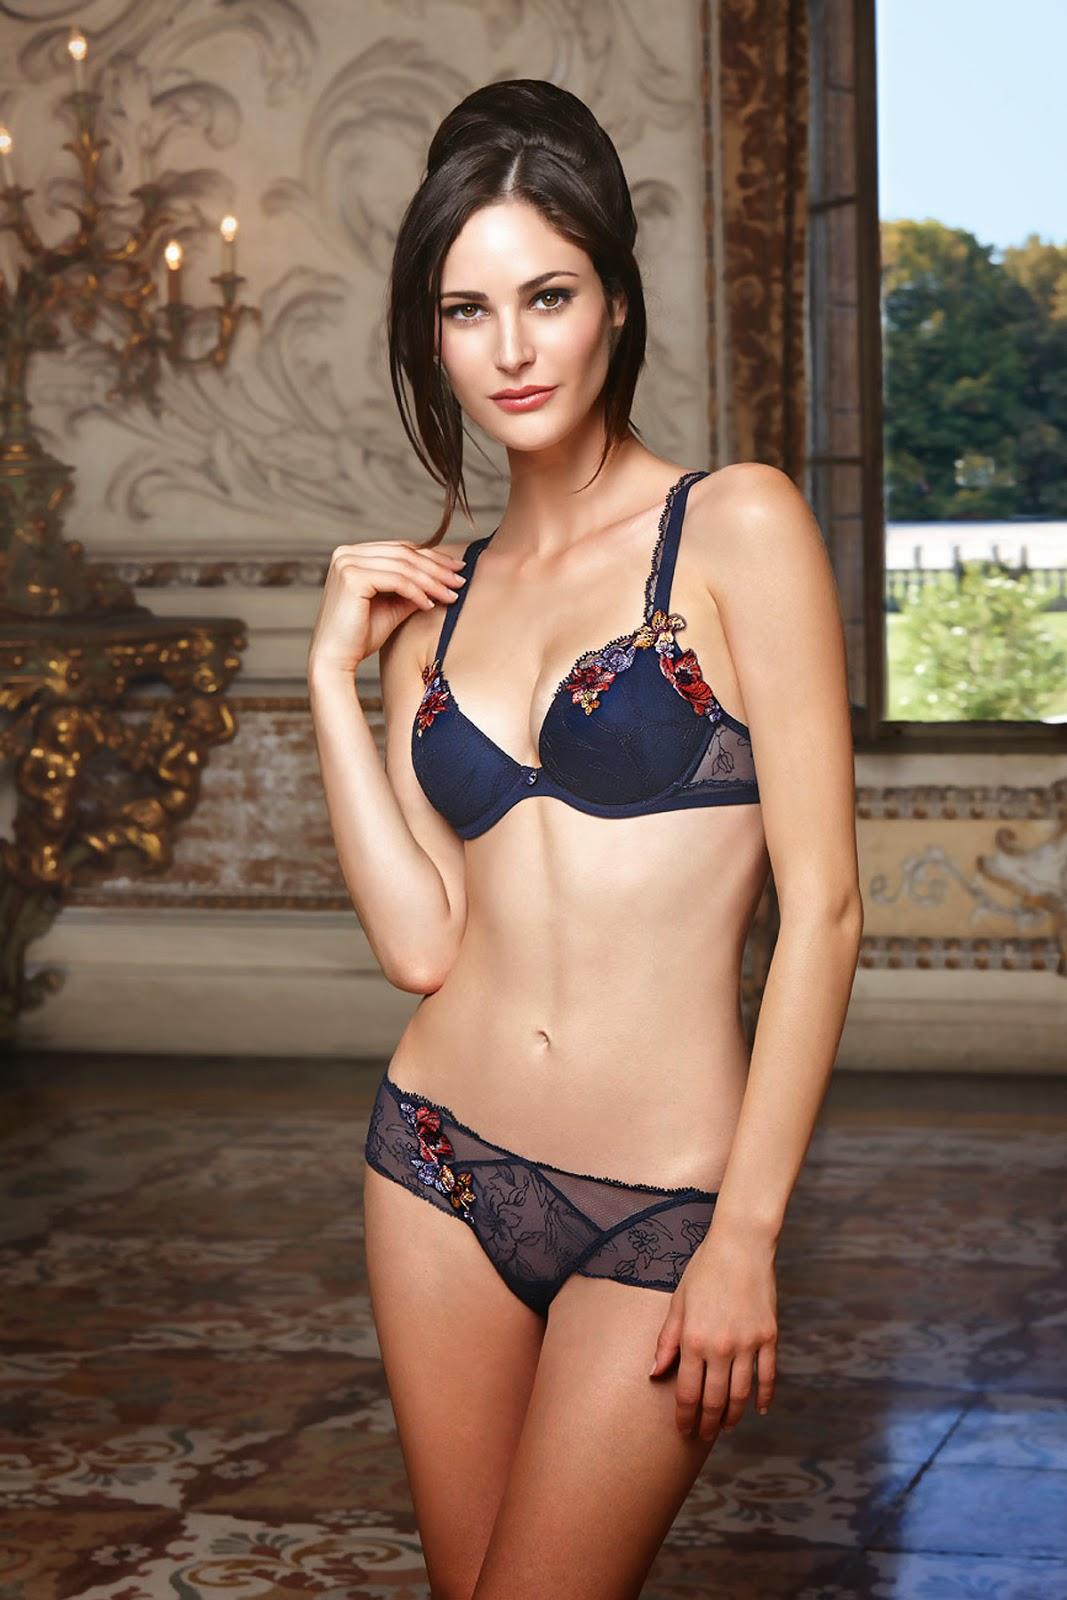 Model Photos Maud Le Fort Lise Charmel Lingerie 2014